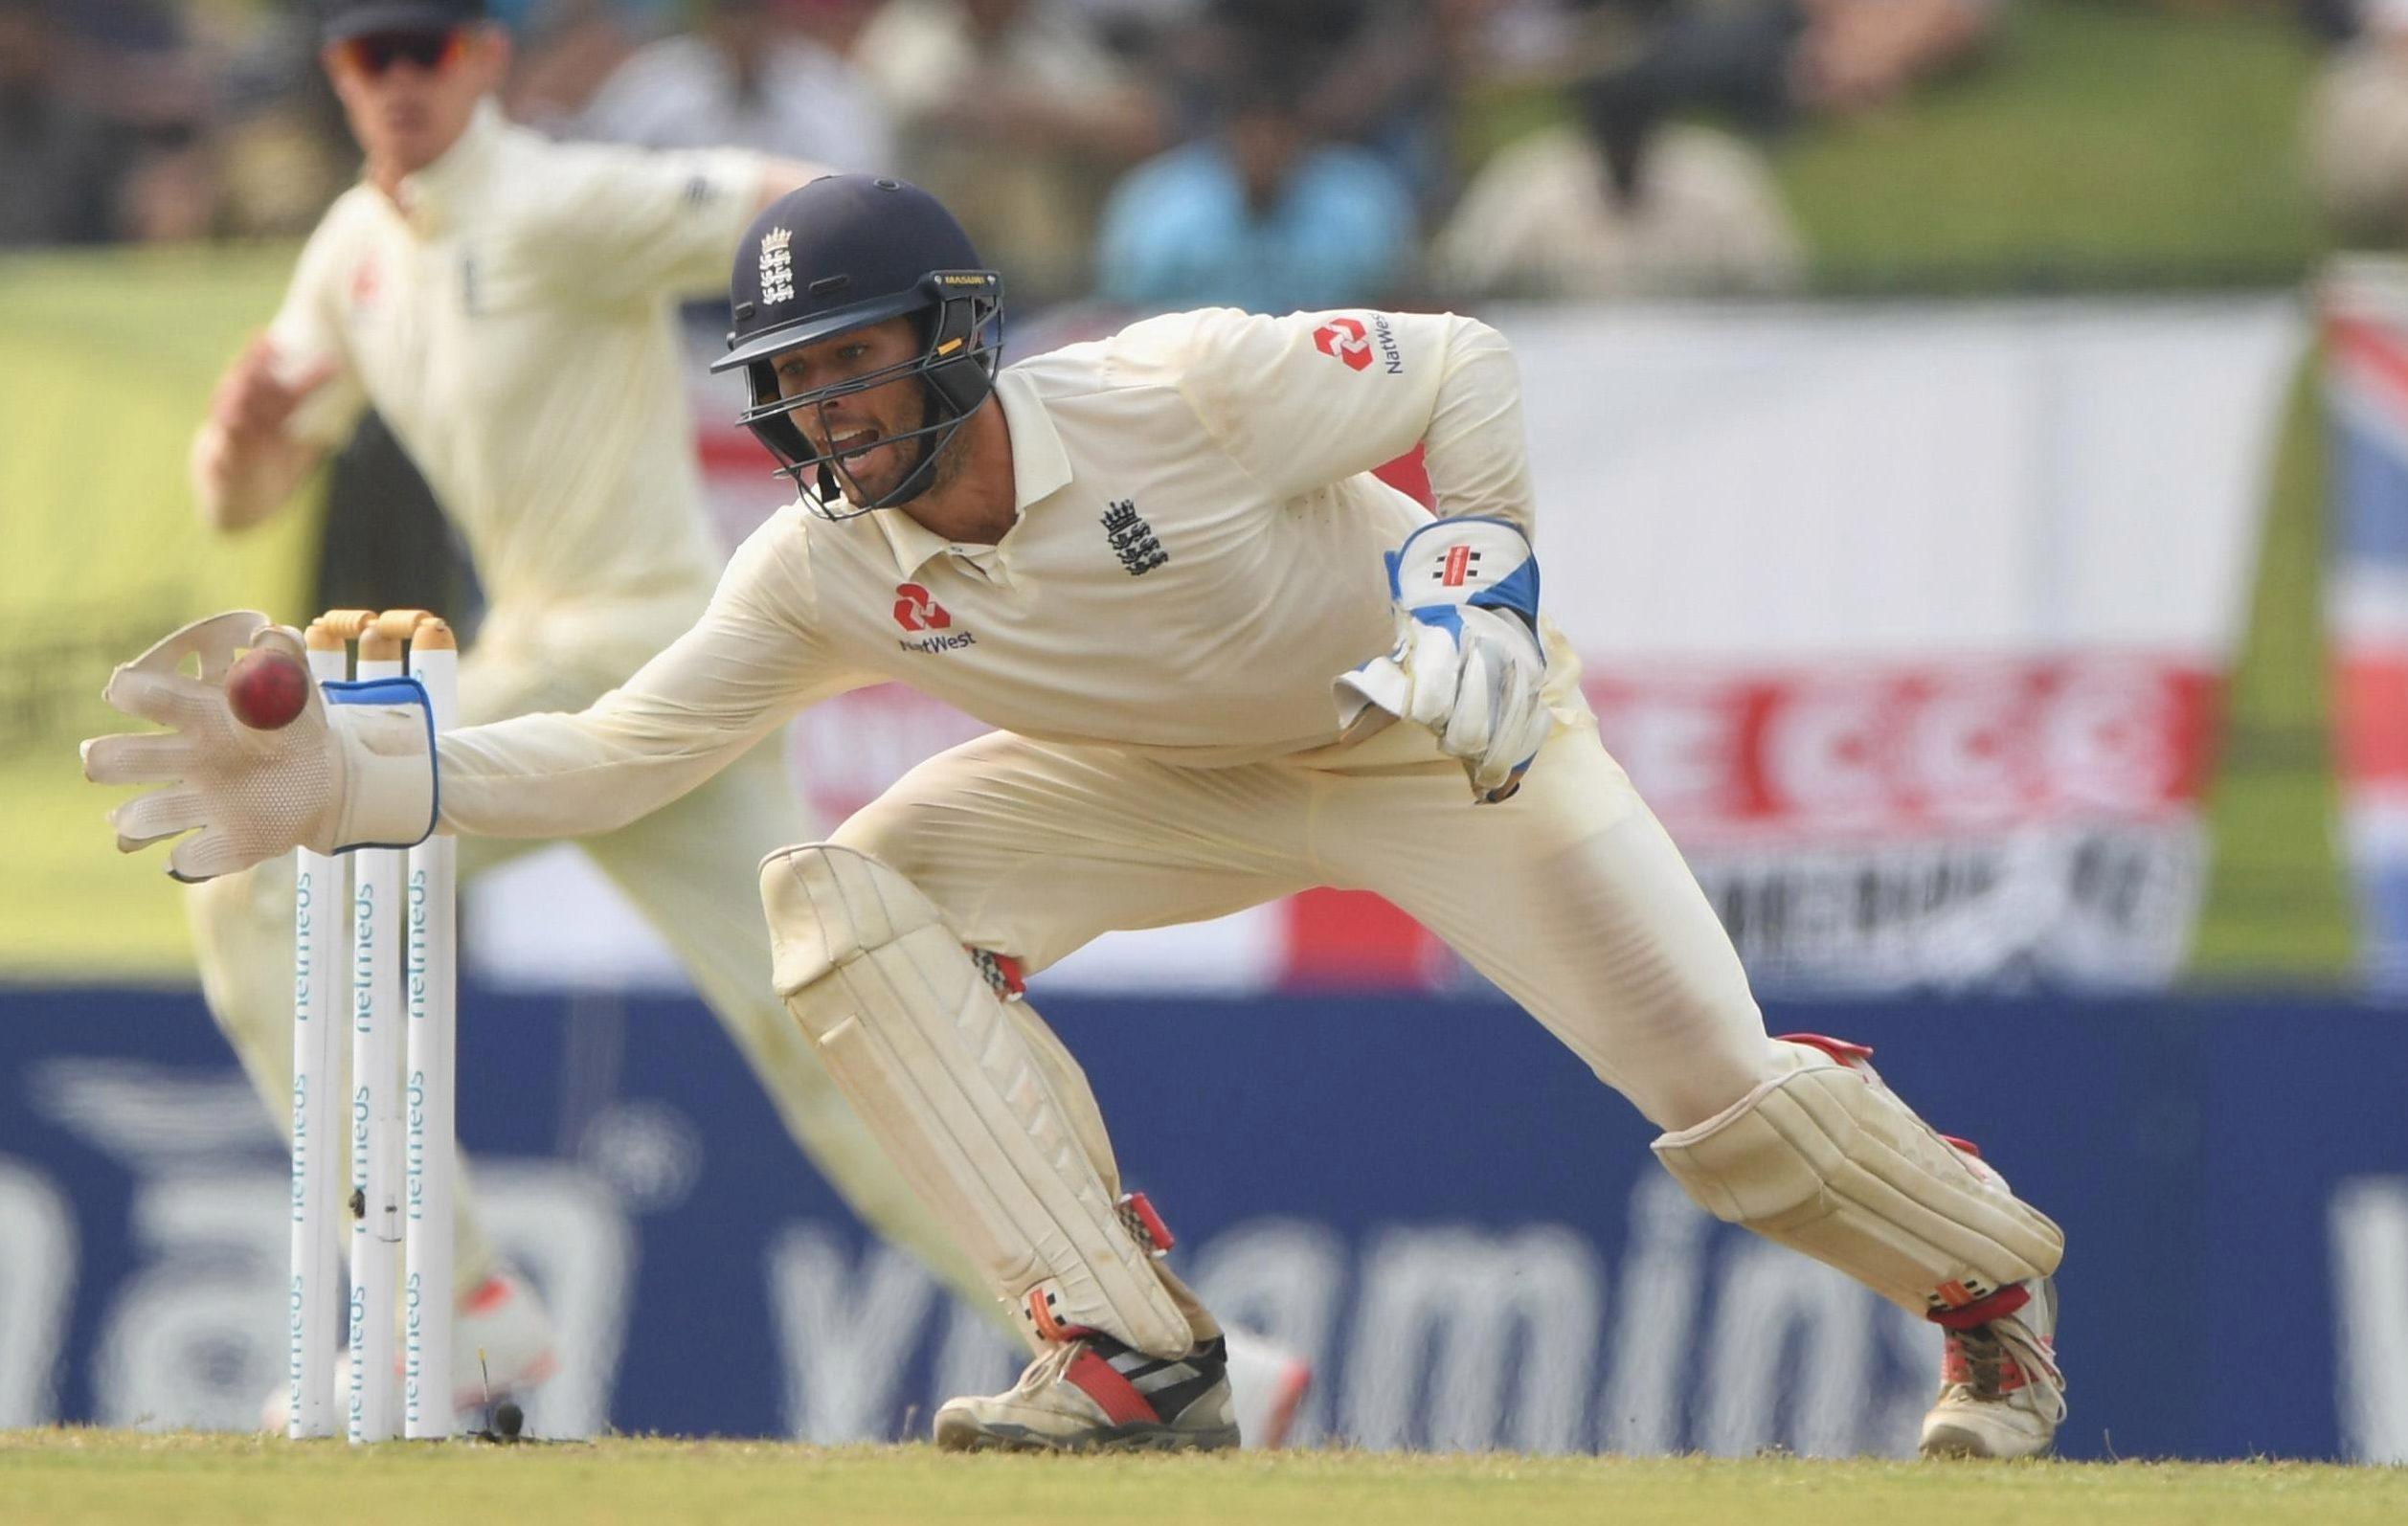 England wicketkeeper Ben Foakes will